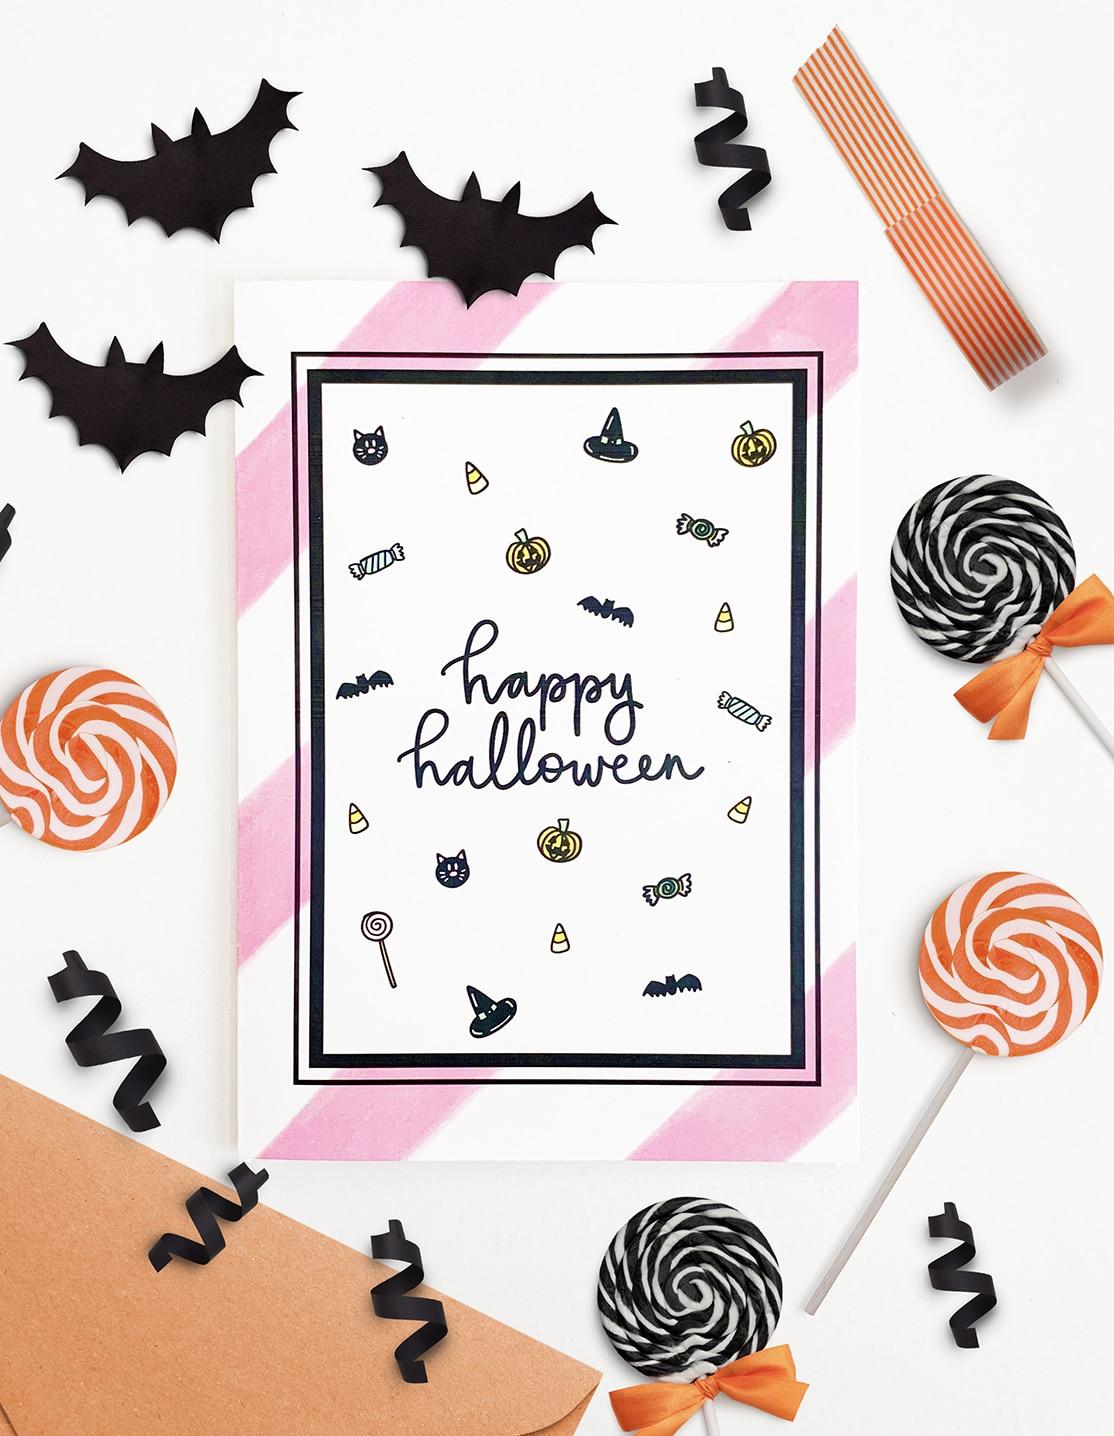 Free Printable Halloween Card Halloween Cards Pineapple Paper Co